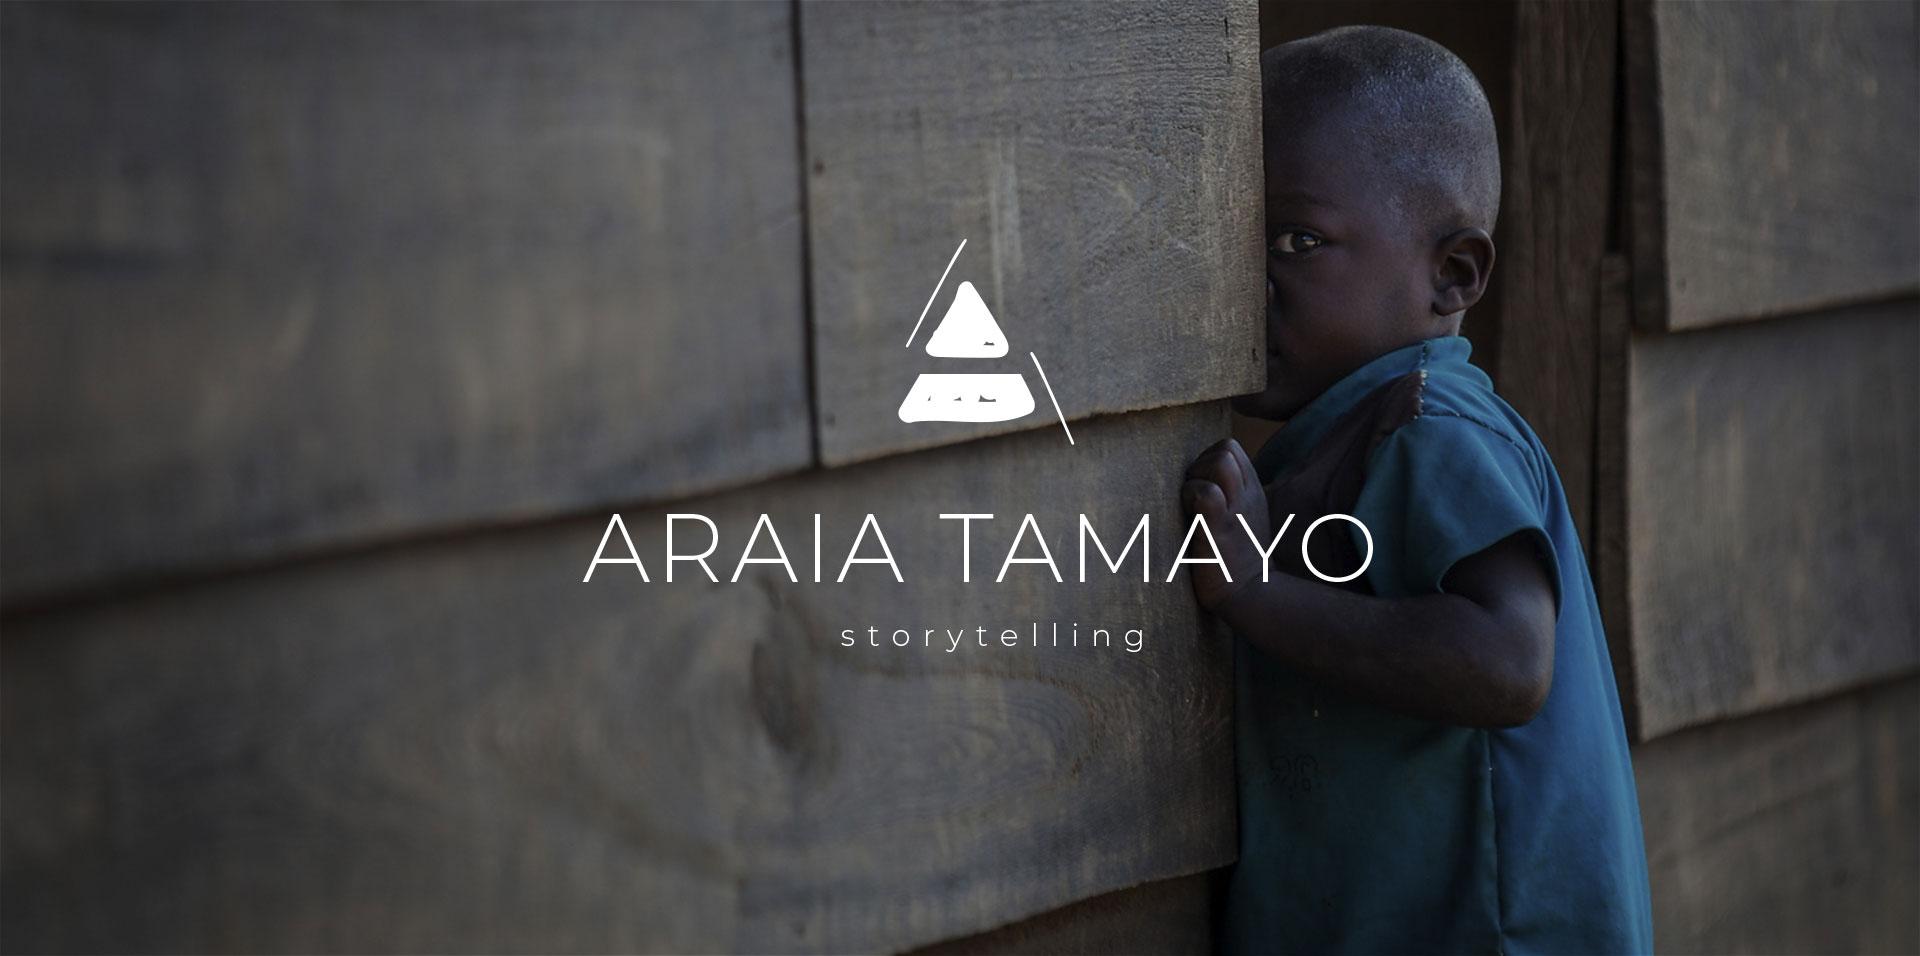 Branding Araia Tamayo